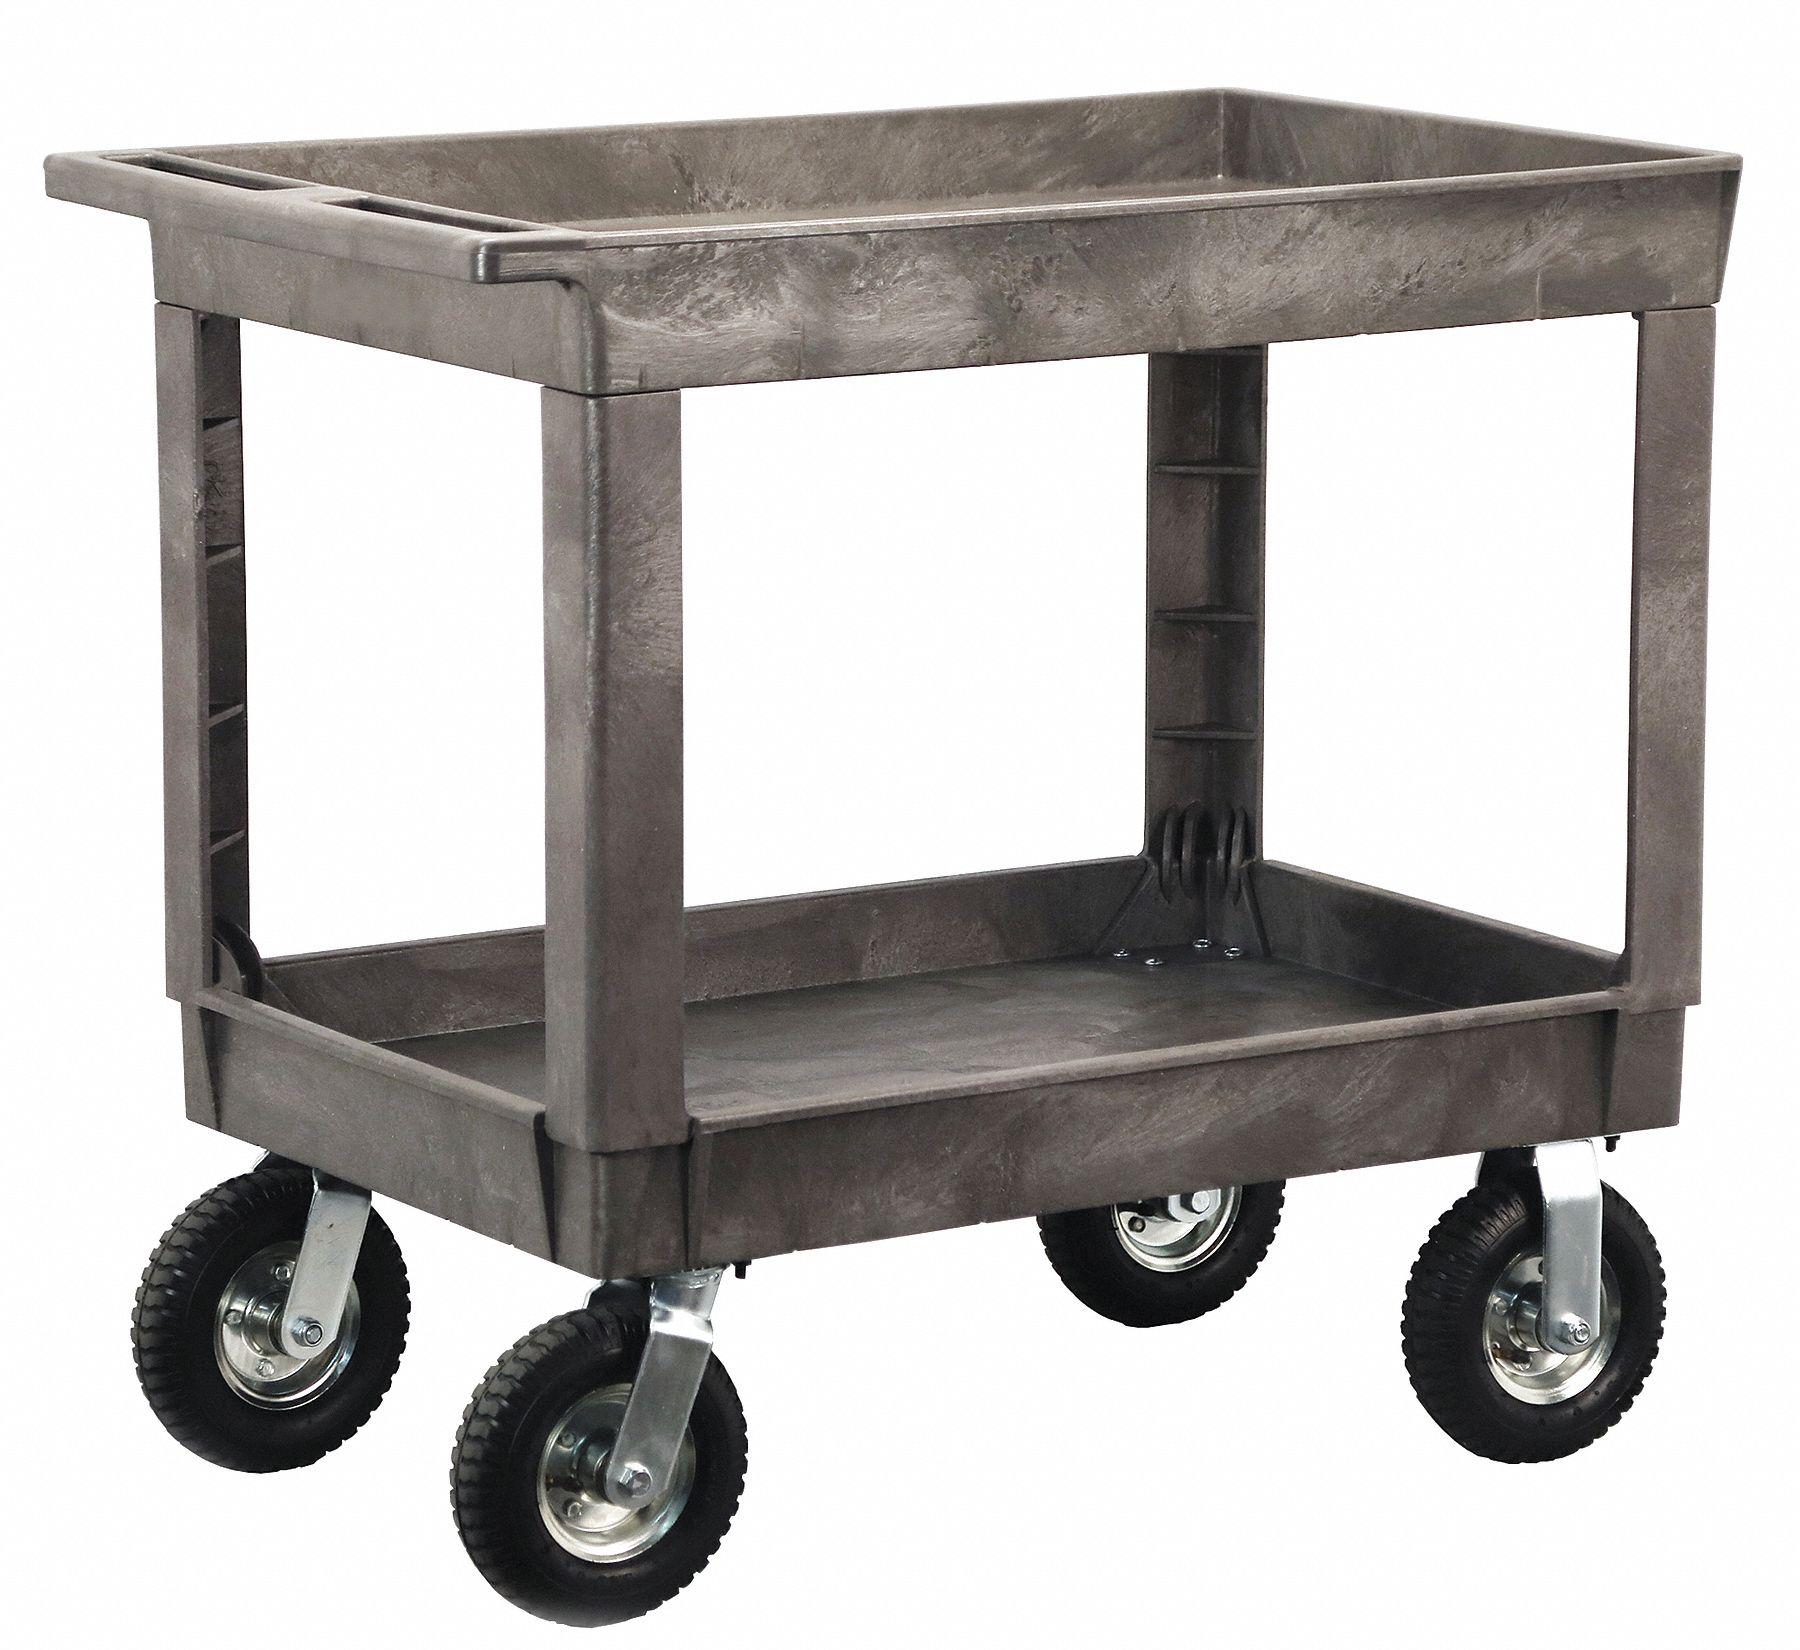 Grainger Approved Utility Cart With Deep Lipped Plastic Shelves 500 Lb Load Capacity Number Of Shelves 2 401r92 2523wwg Grainger